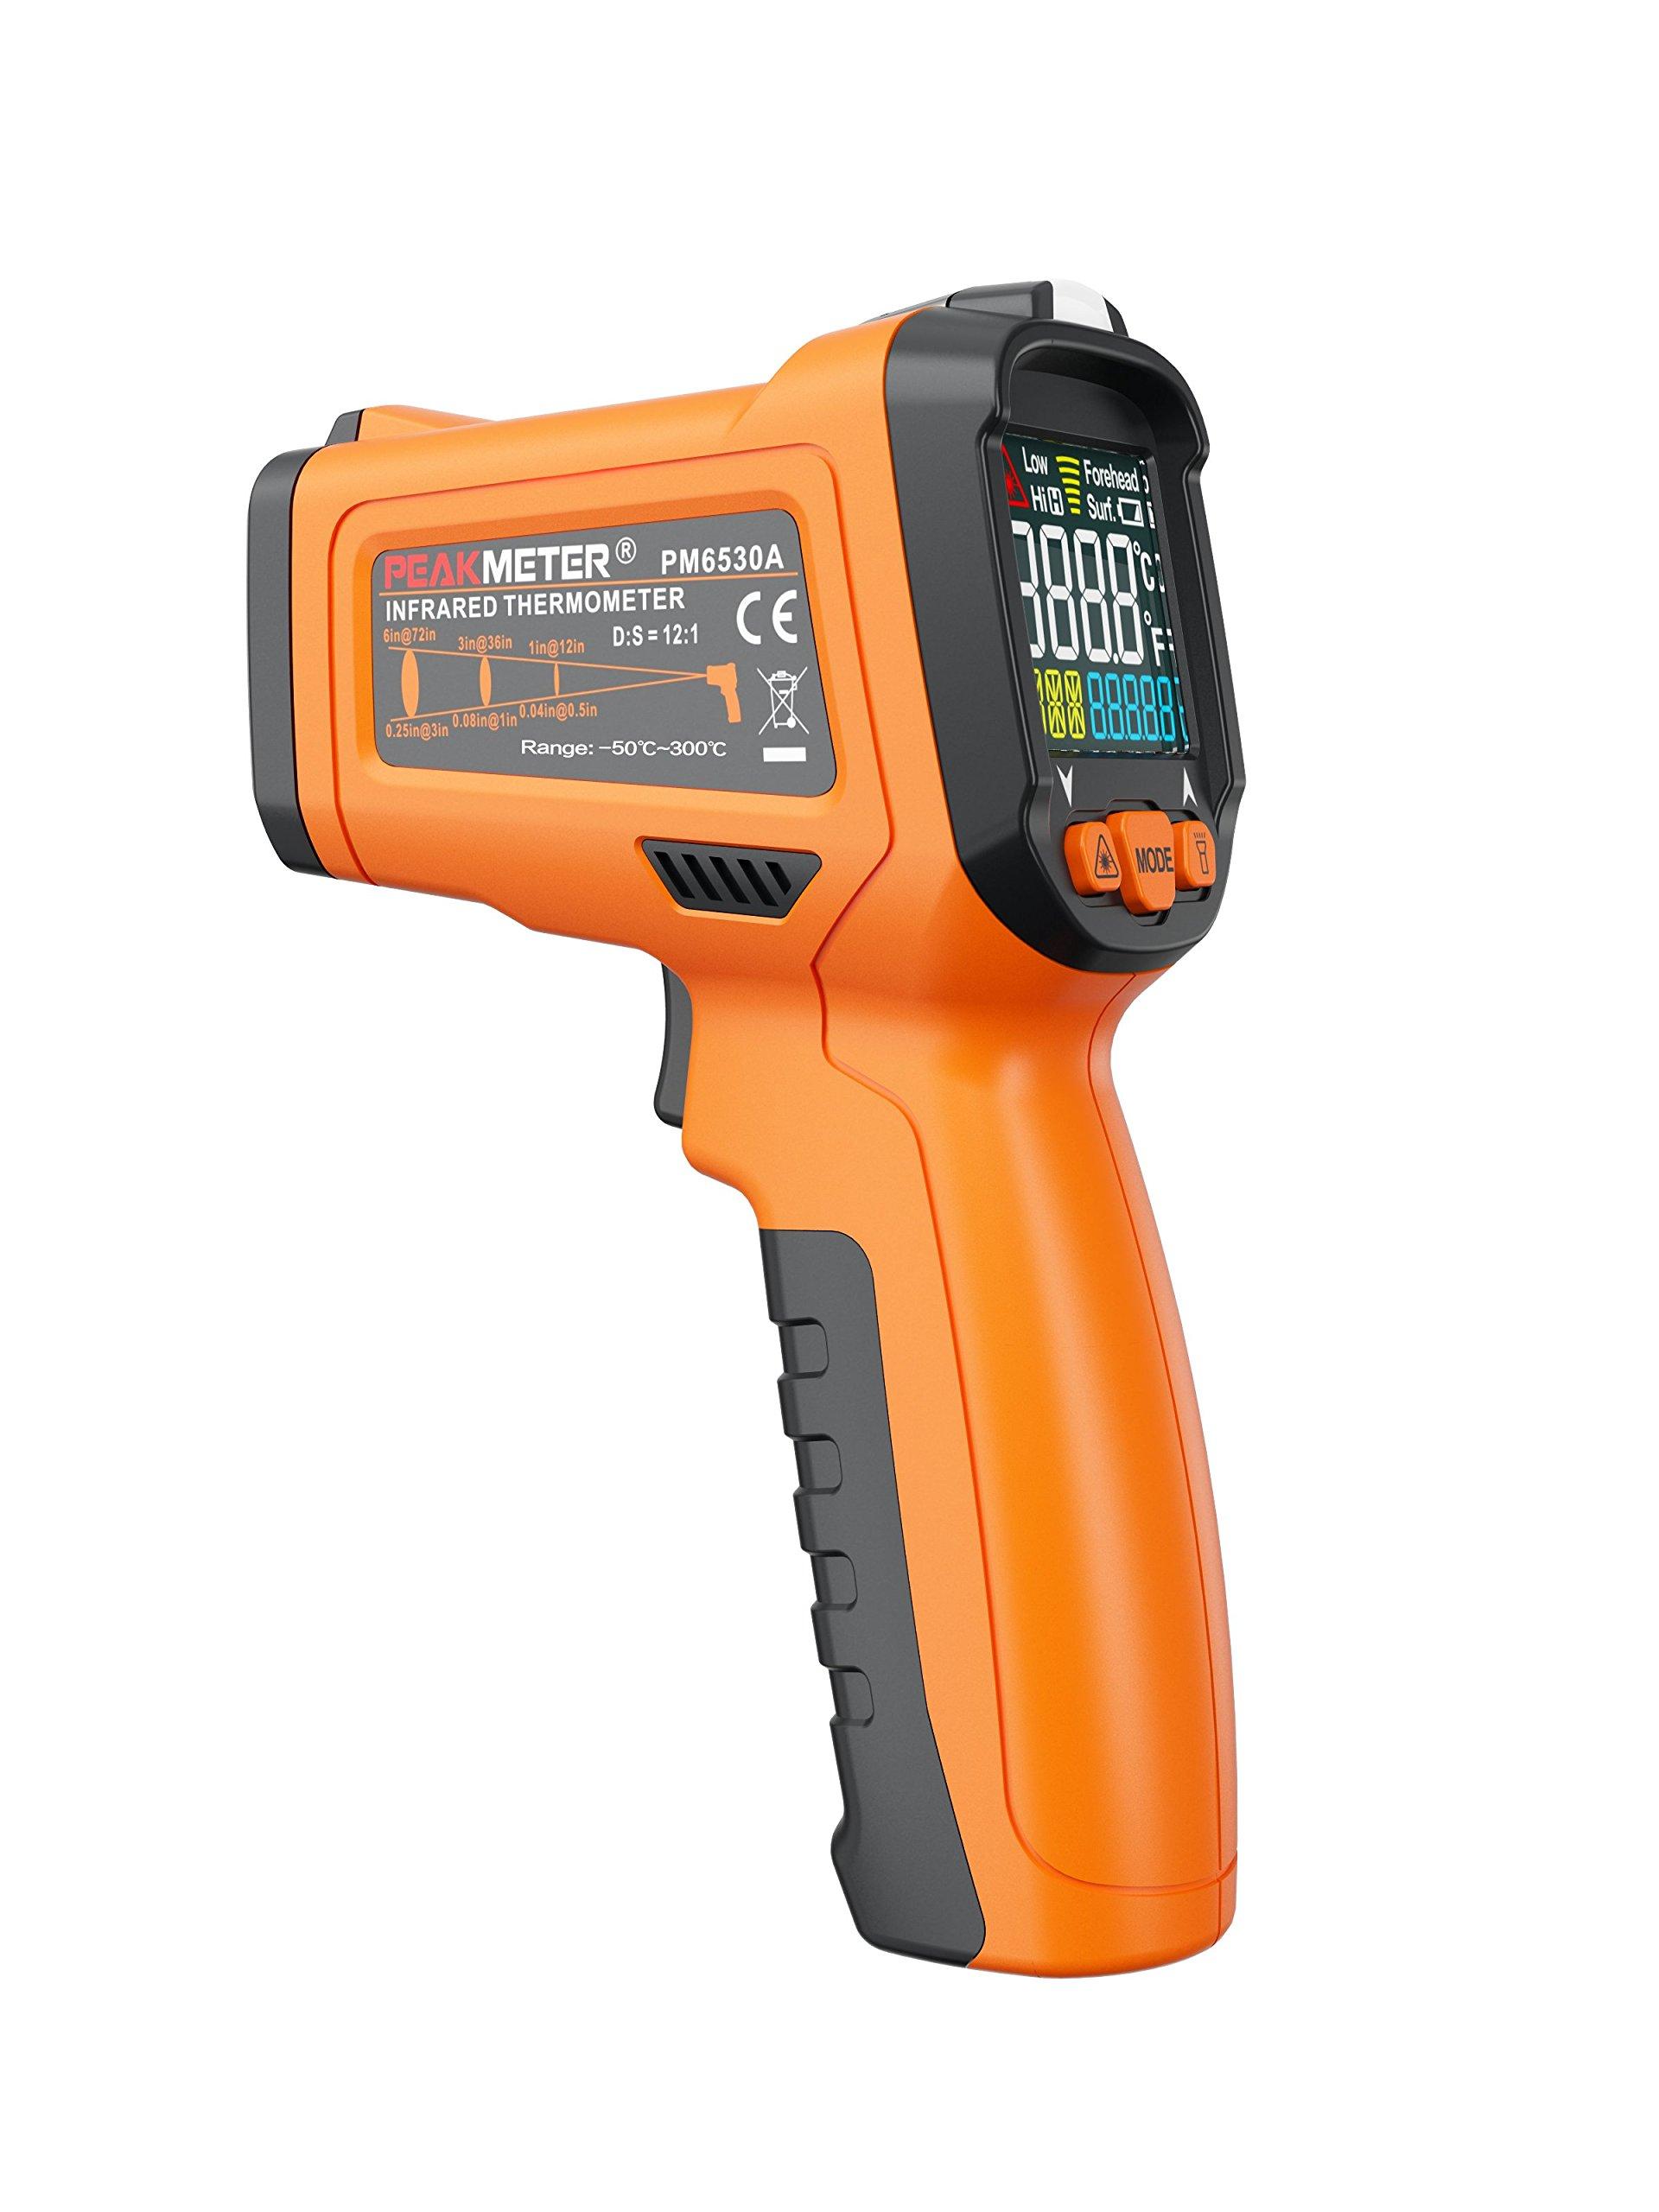 PEAKMETER PM6530A 1080 Non-contact Digital Laser Infrared Thermometer Temperature Tester Temperature Gun -50-300℃(-58-572°F)Orange